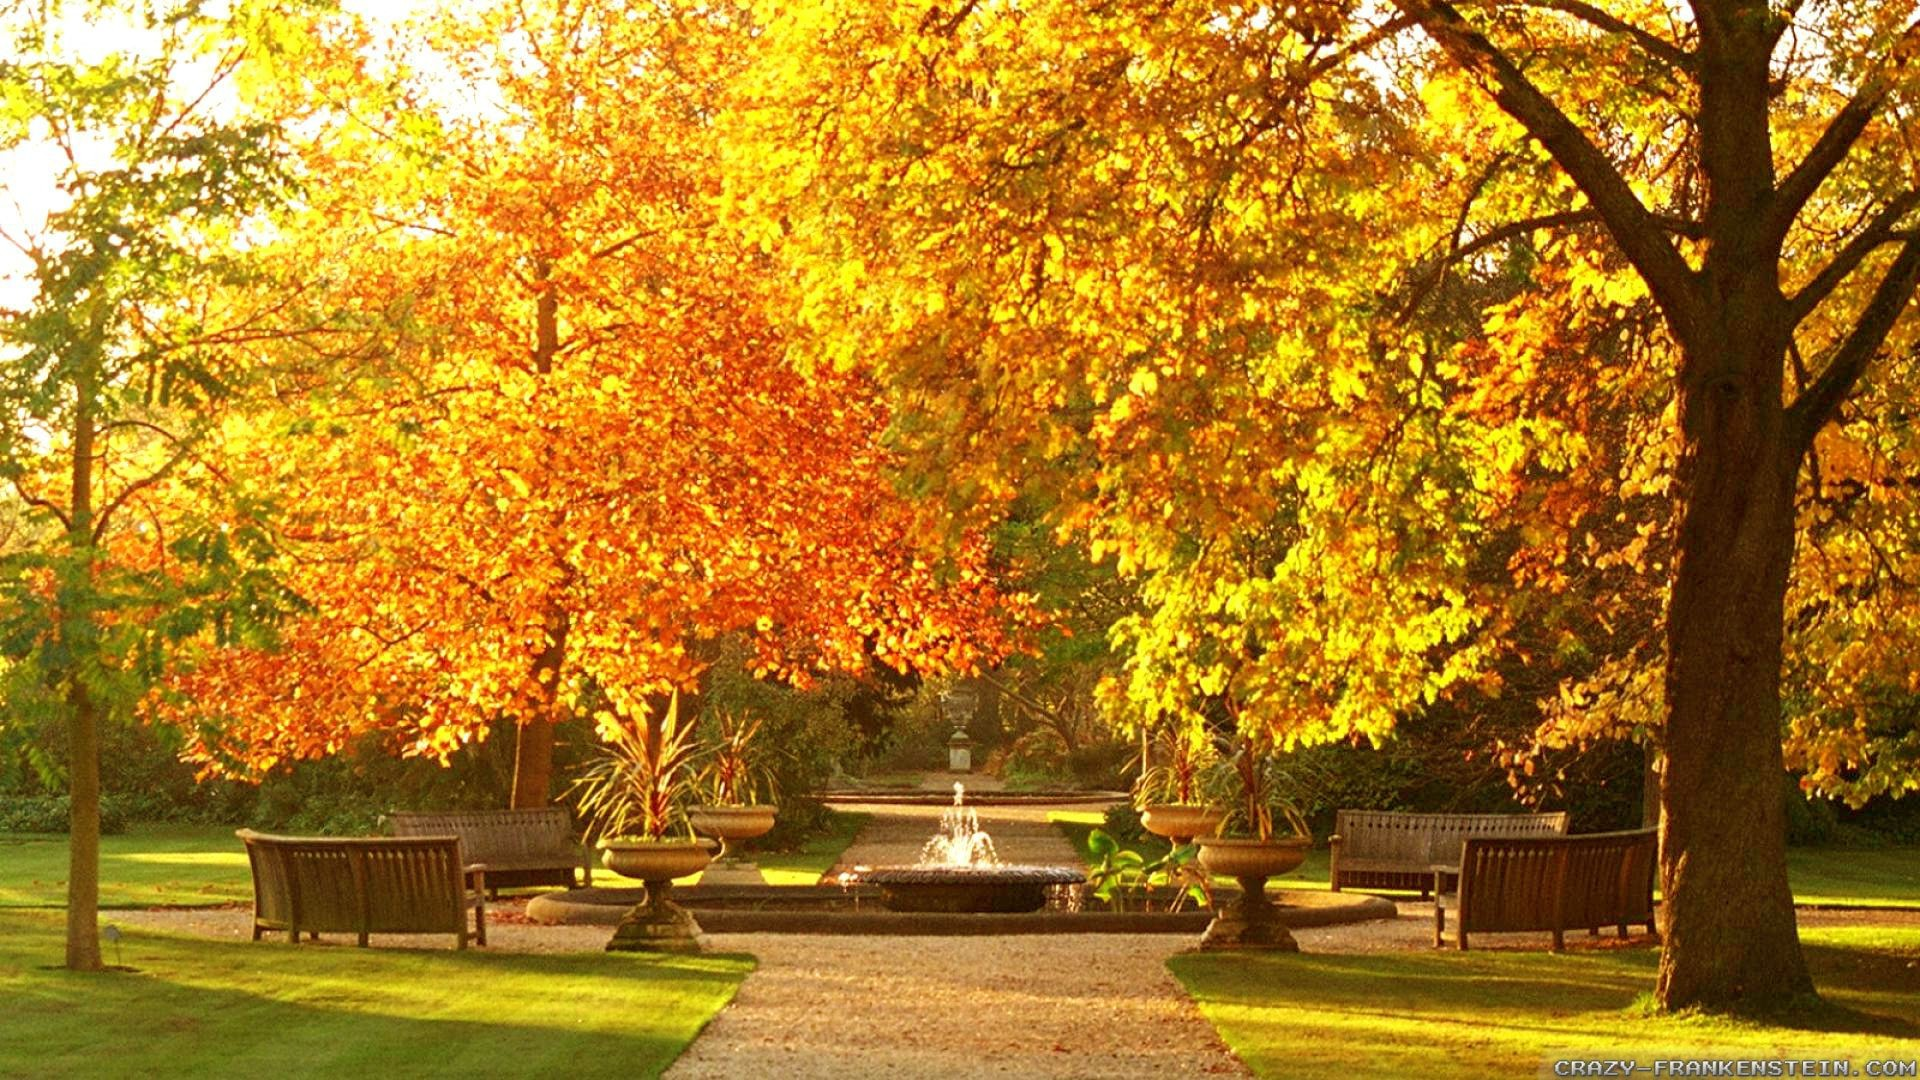 Beautiful Botanic Garden Autumn Wallpapers Widescreen 1920x1080